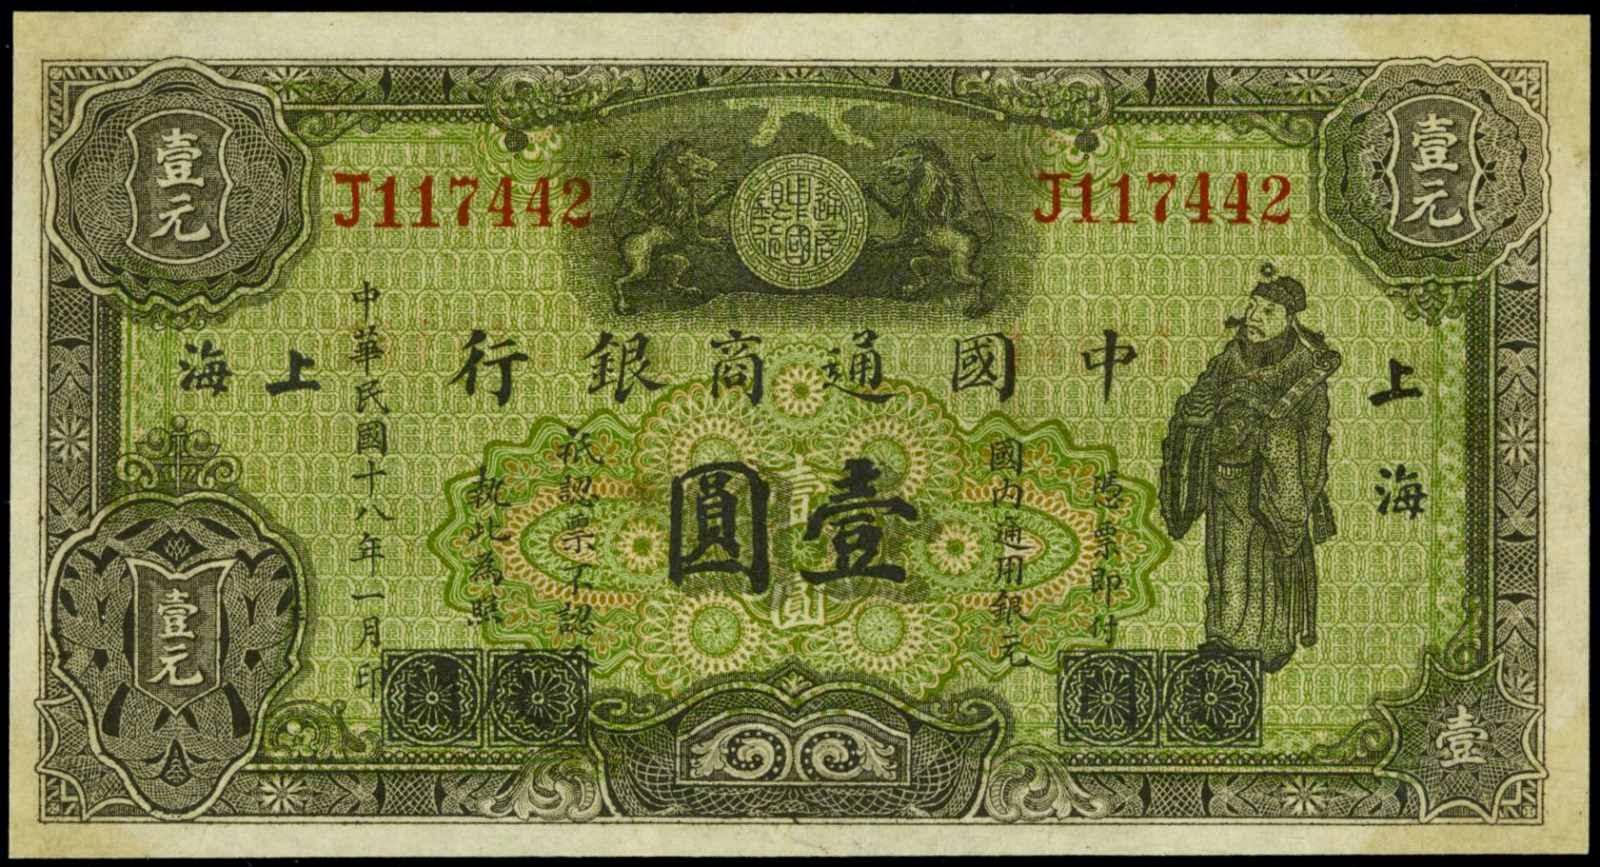 Banknotes Chinese Banks 1 Dollar 1929 Commercial Bank of China.